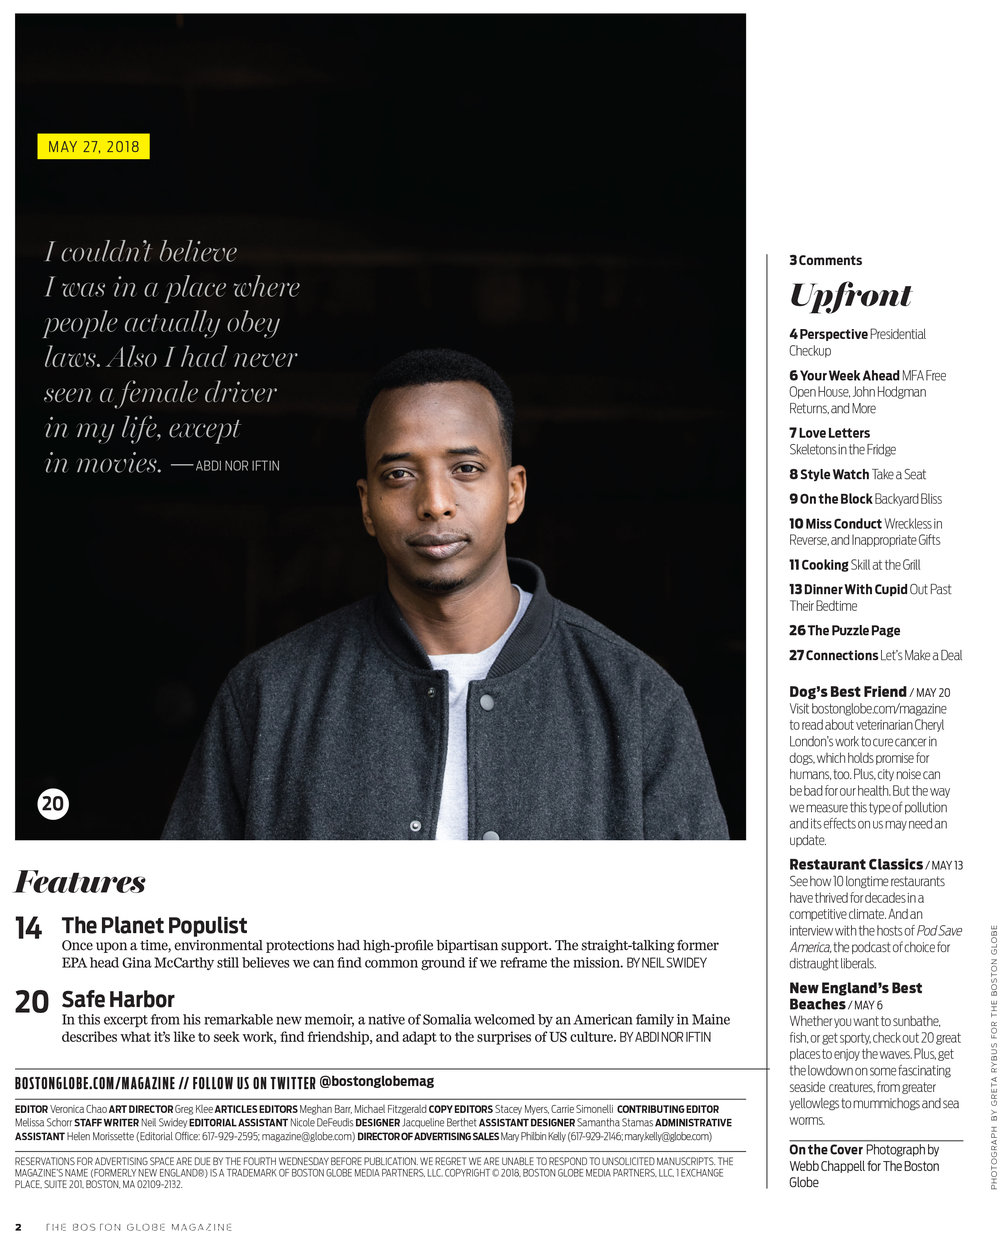 20180527-Magazine-A-002-Magazine-BostonGlobe.jpg